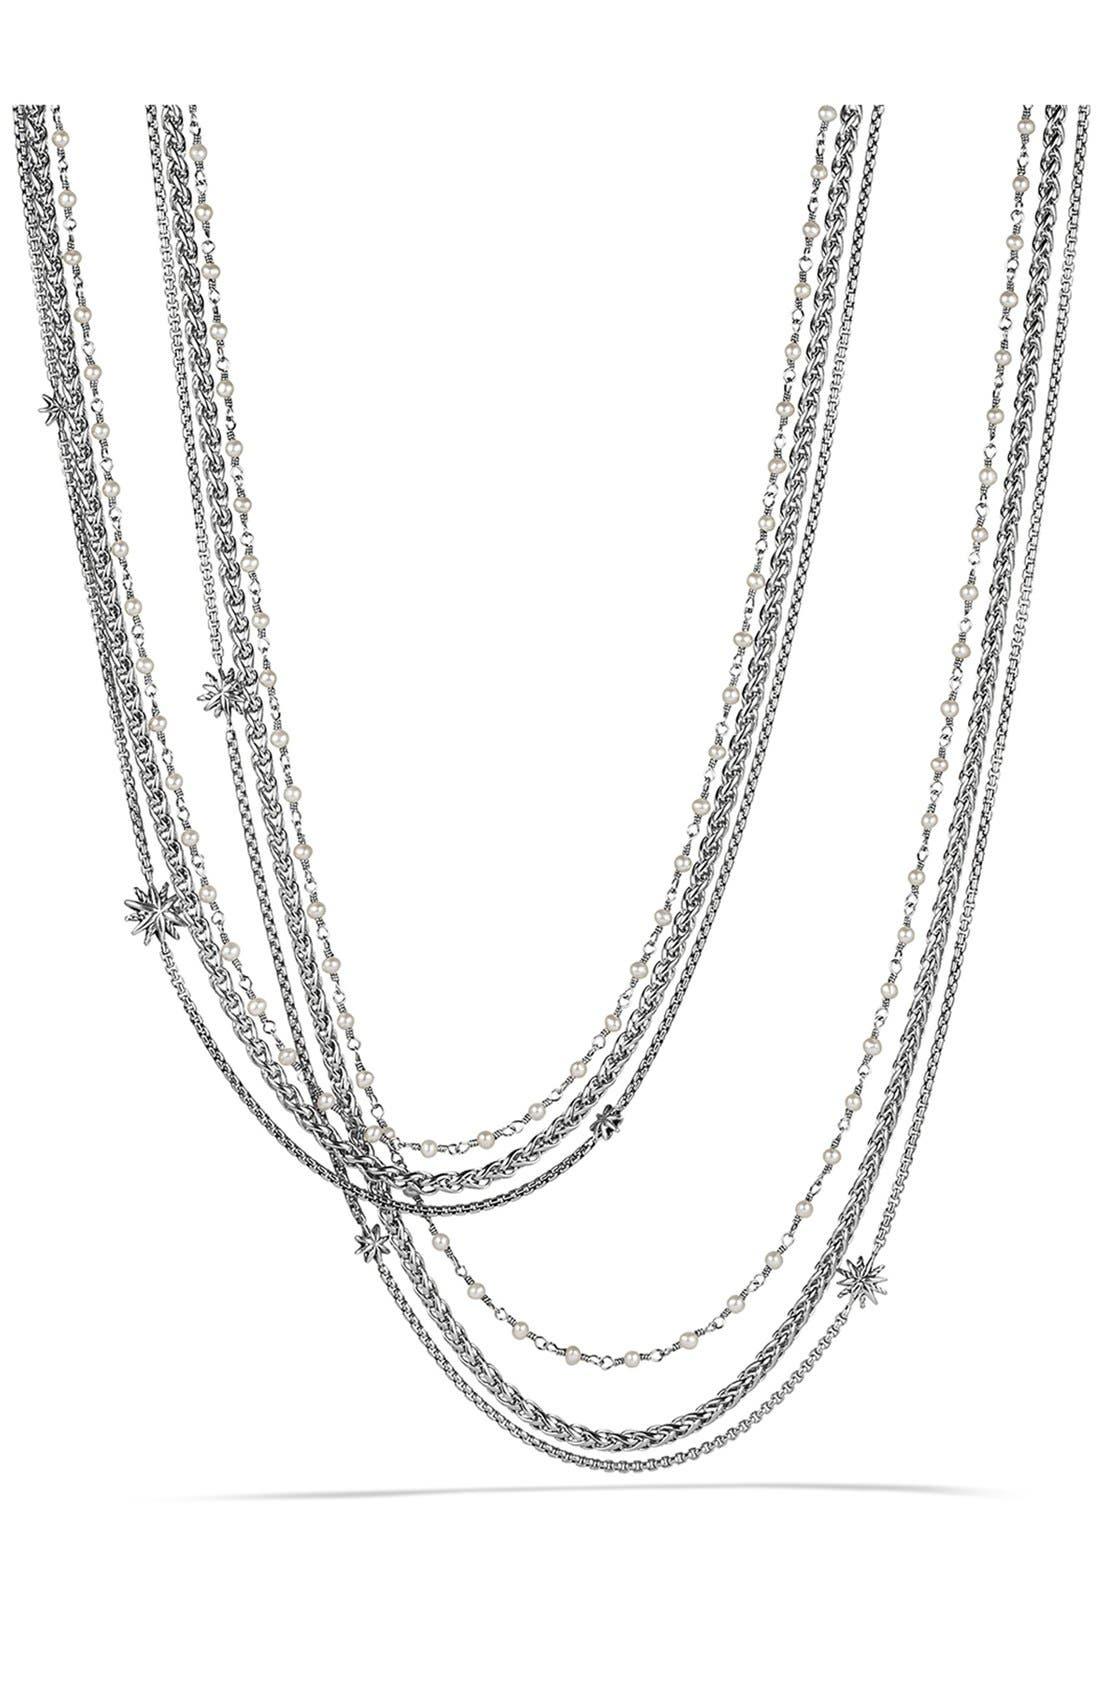 DAVID YURMAN Starburst Chain Necklace with Pearls